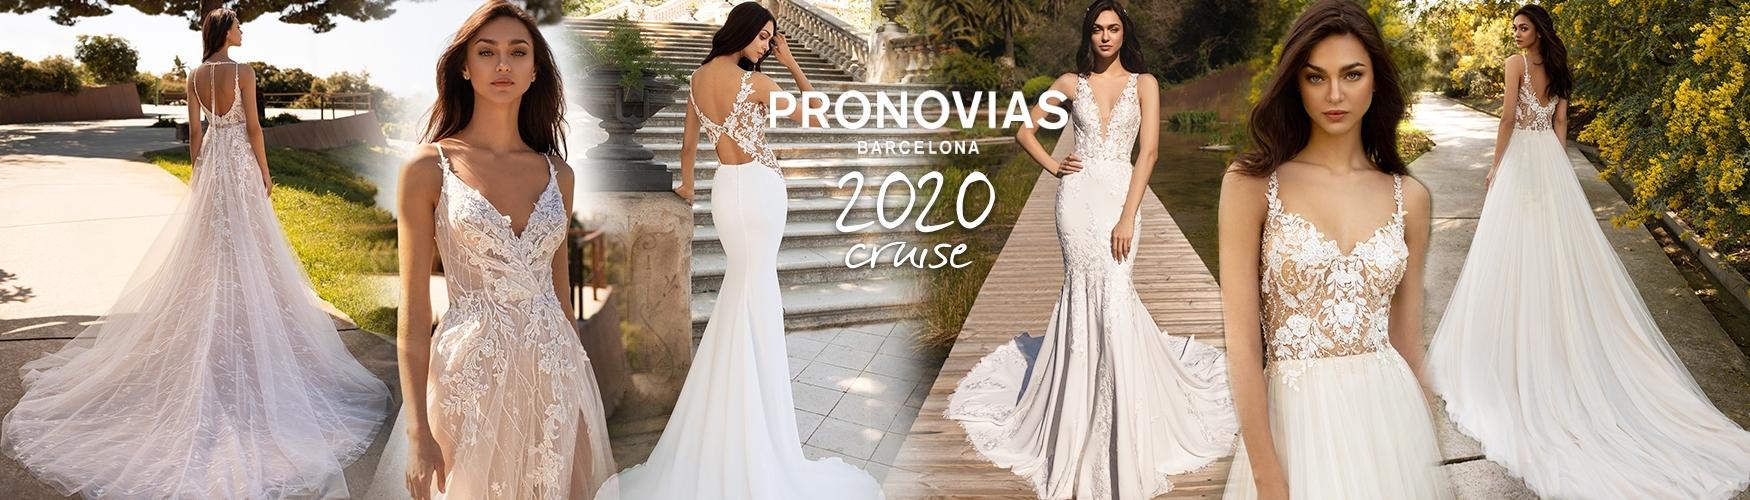 Pronovias Cruise 2020